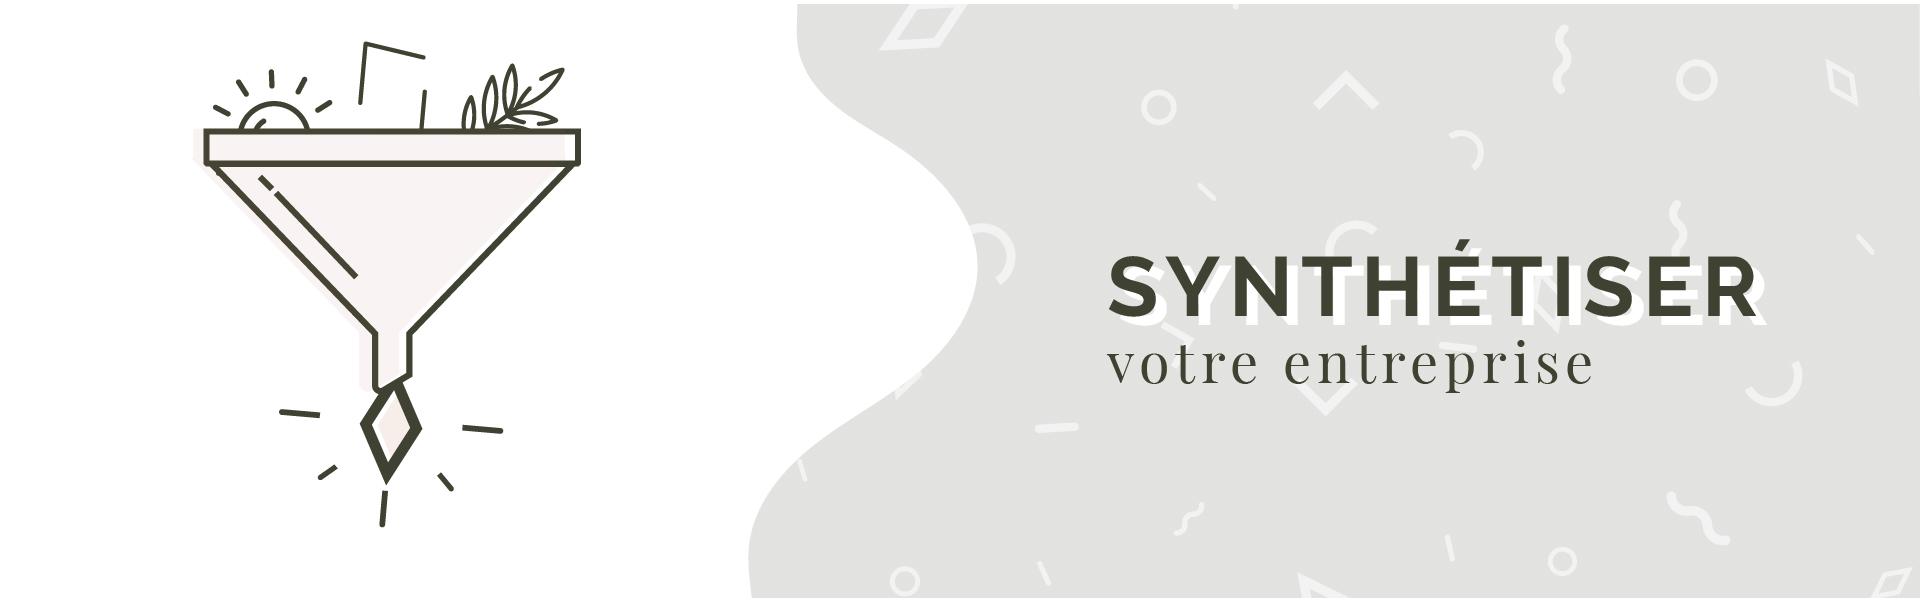 marie-babeau-graphiste-strasbourg-alsace-article-blog-logo-identite-visuelle